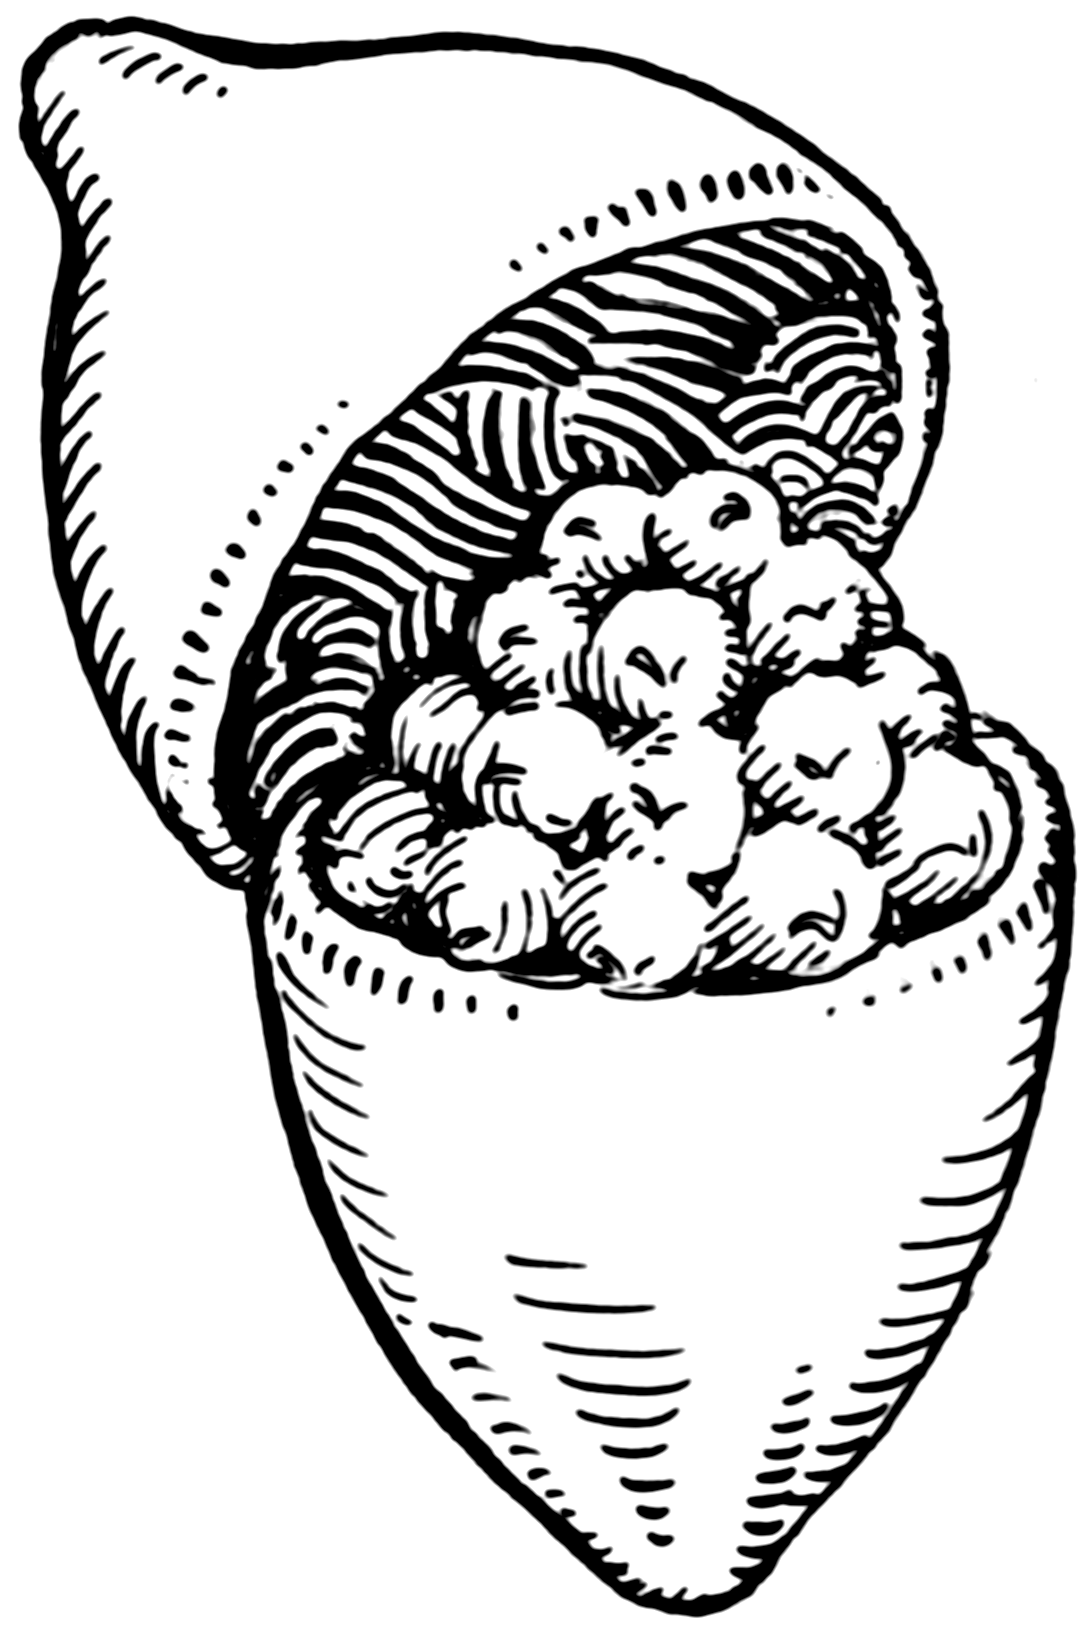 Capsule (botany).